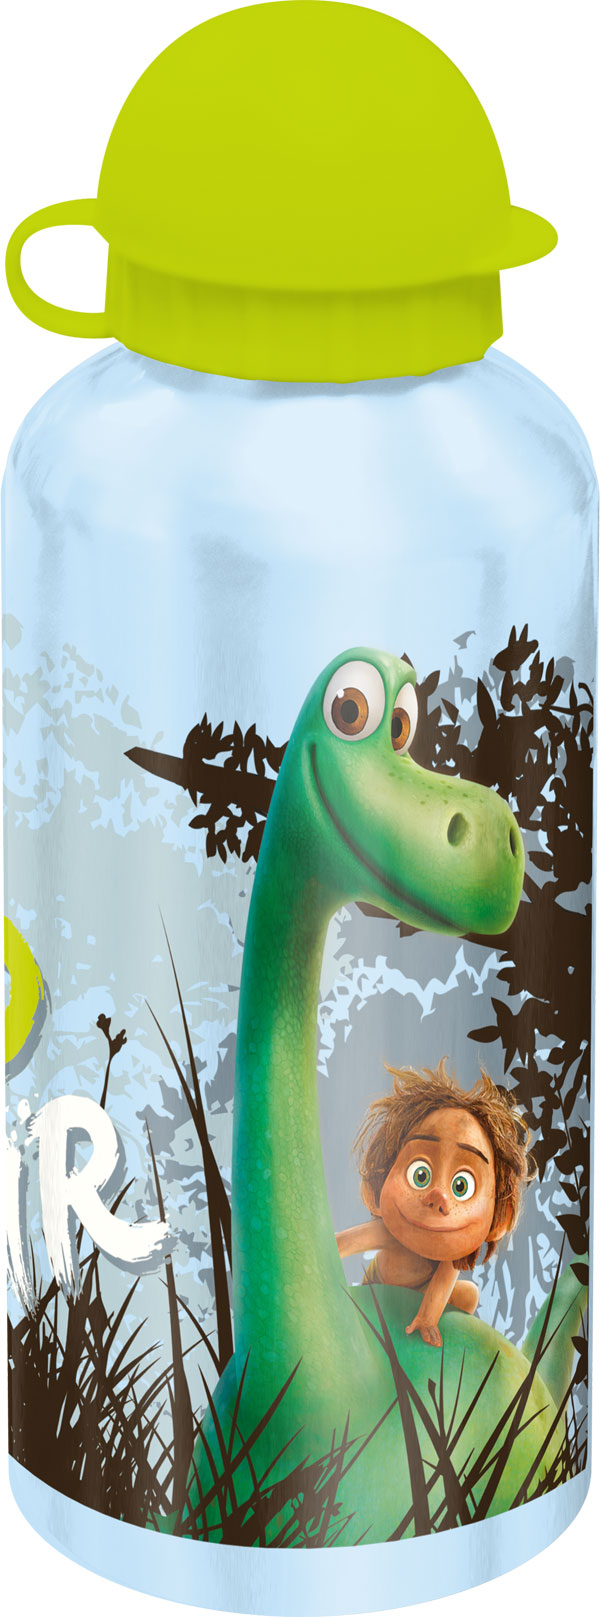 ALU fľaša Hodný Dinosaurus Arlo